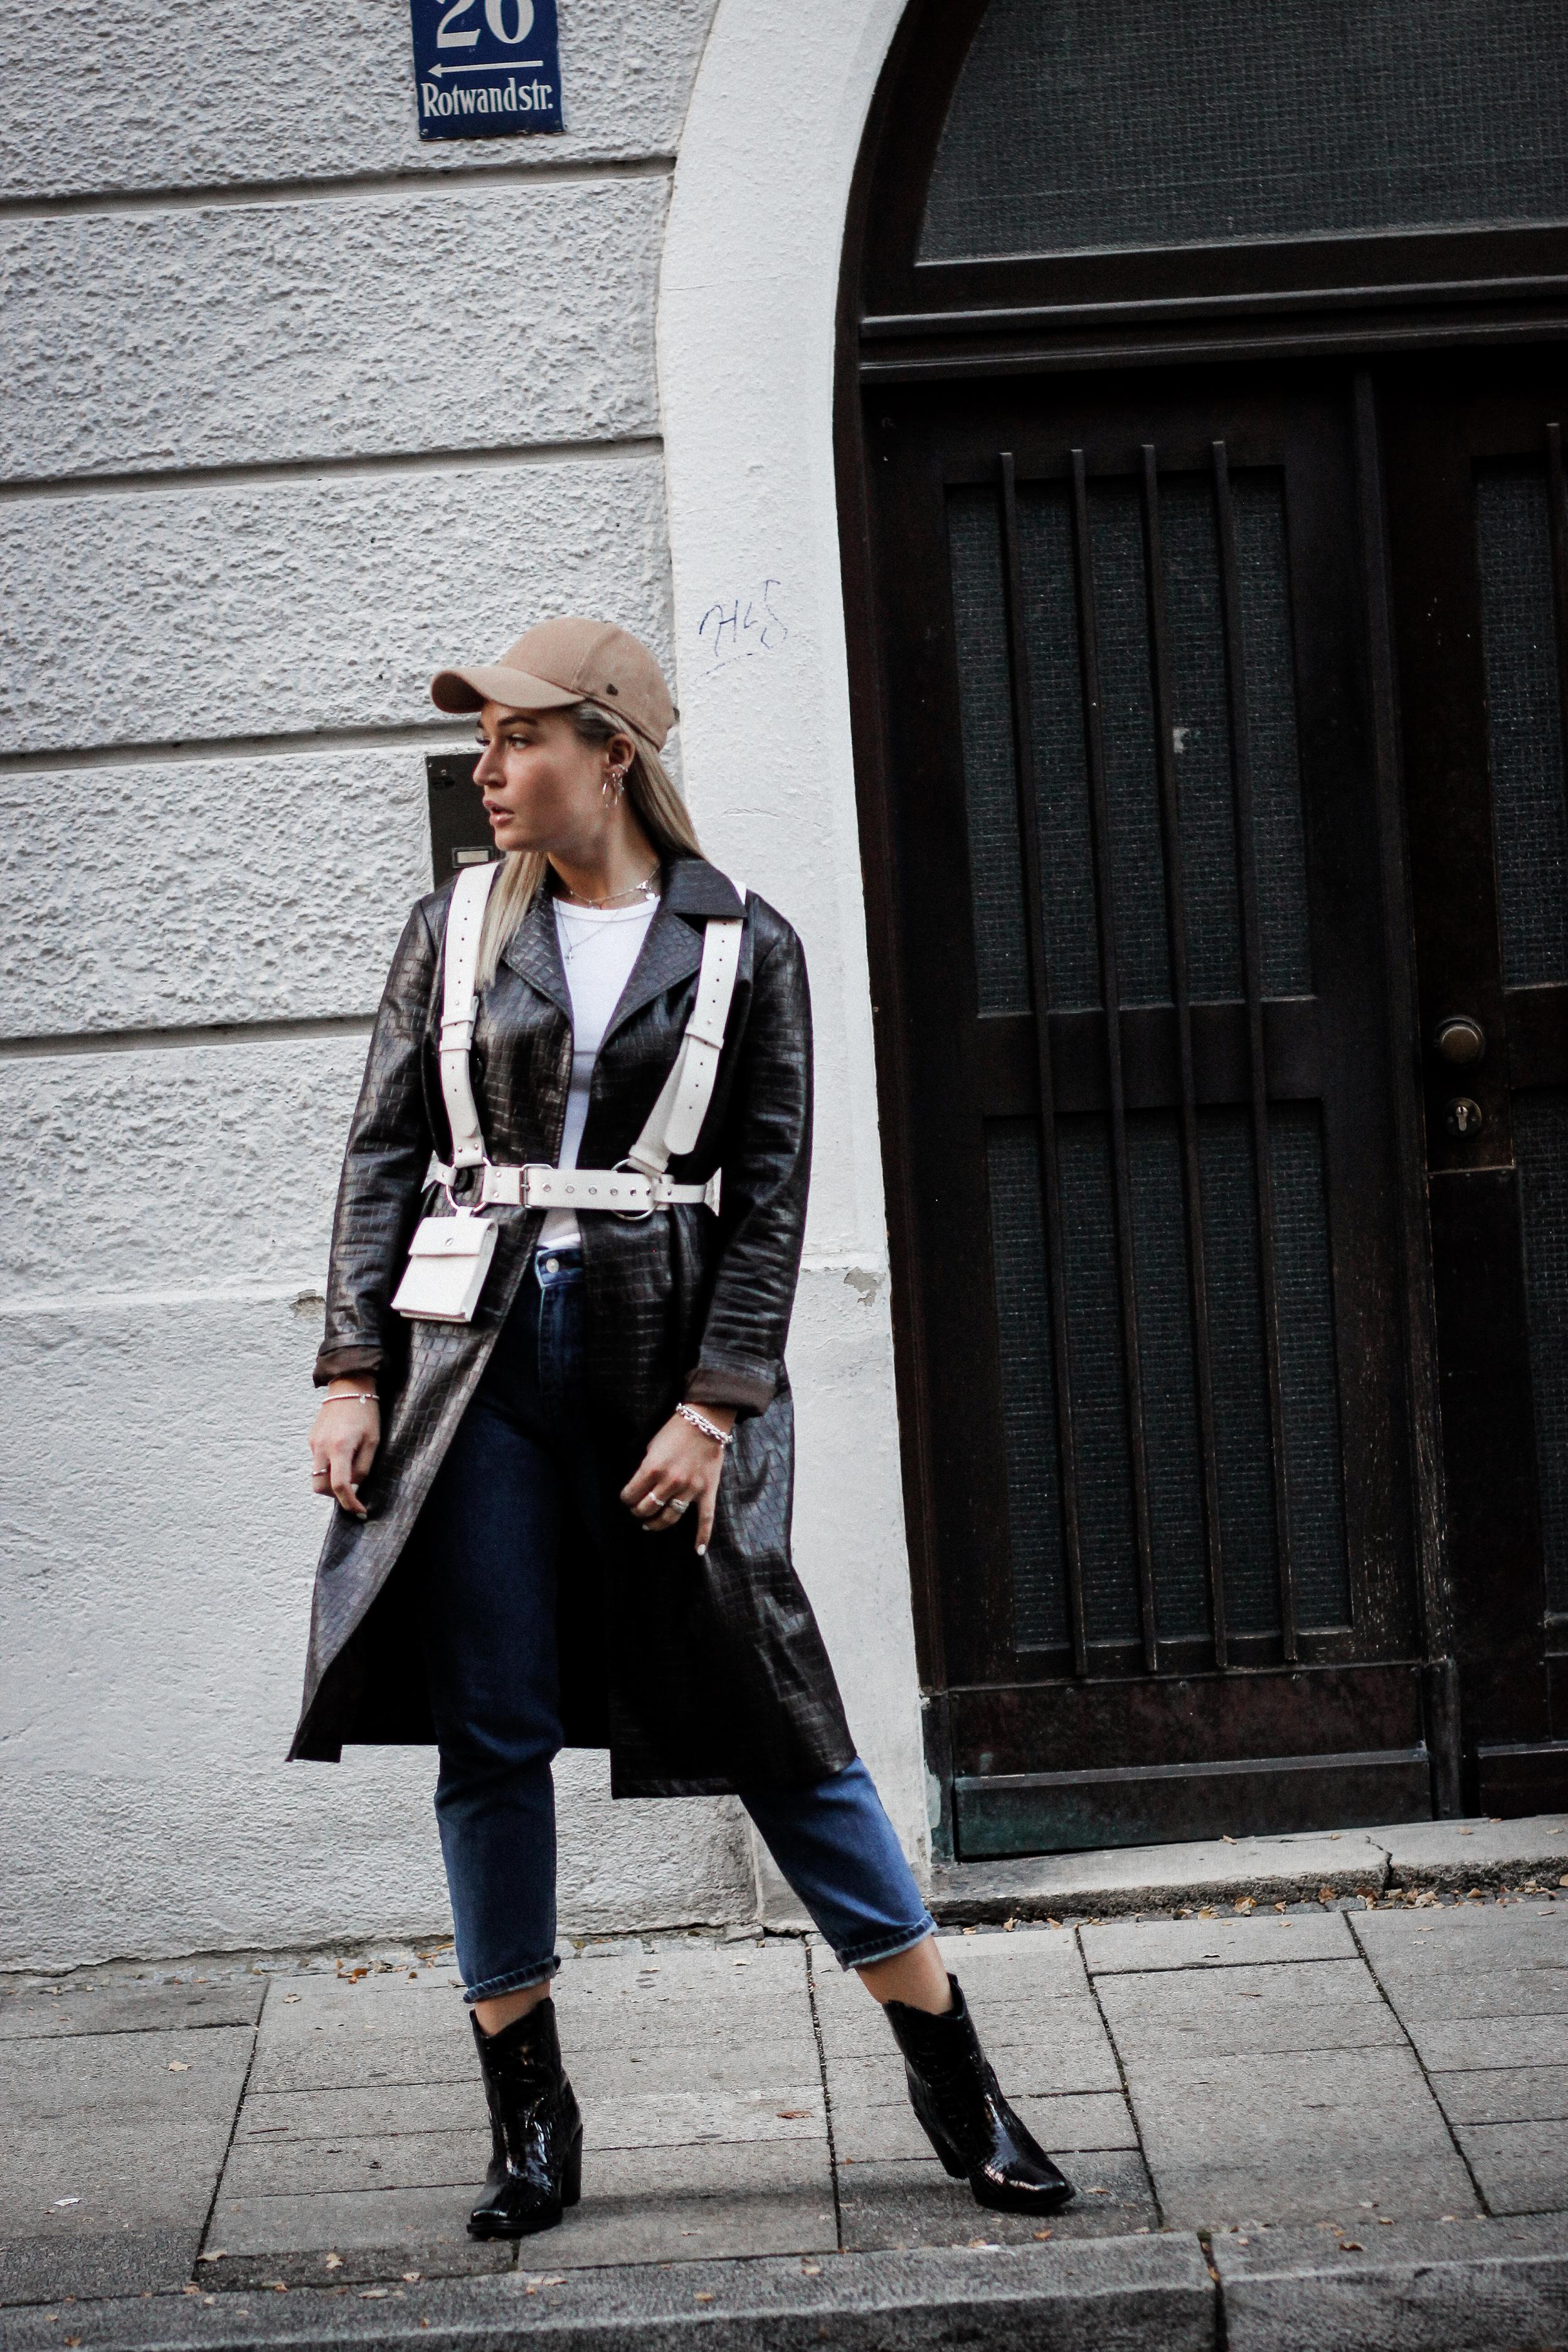 Lauralamode Fashion Blogger Fashionblogger Mantel Coat Herbst Herbsttrend Leather Coat Ledermantel Streetstyle Look Ootd Munich Berlin Deutschland5